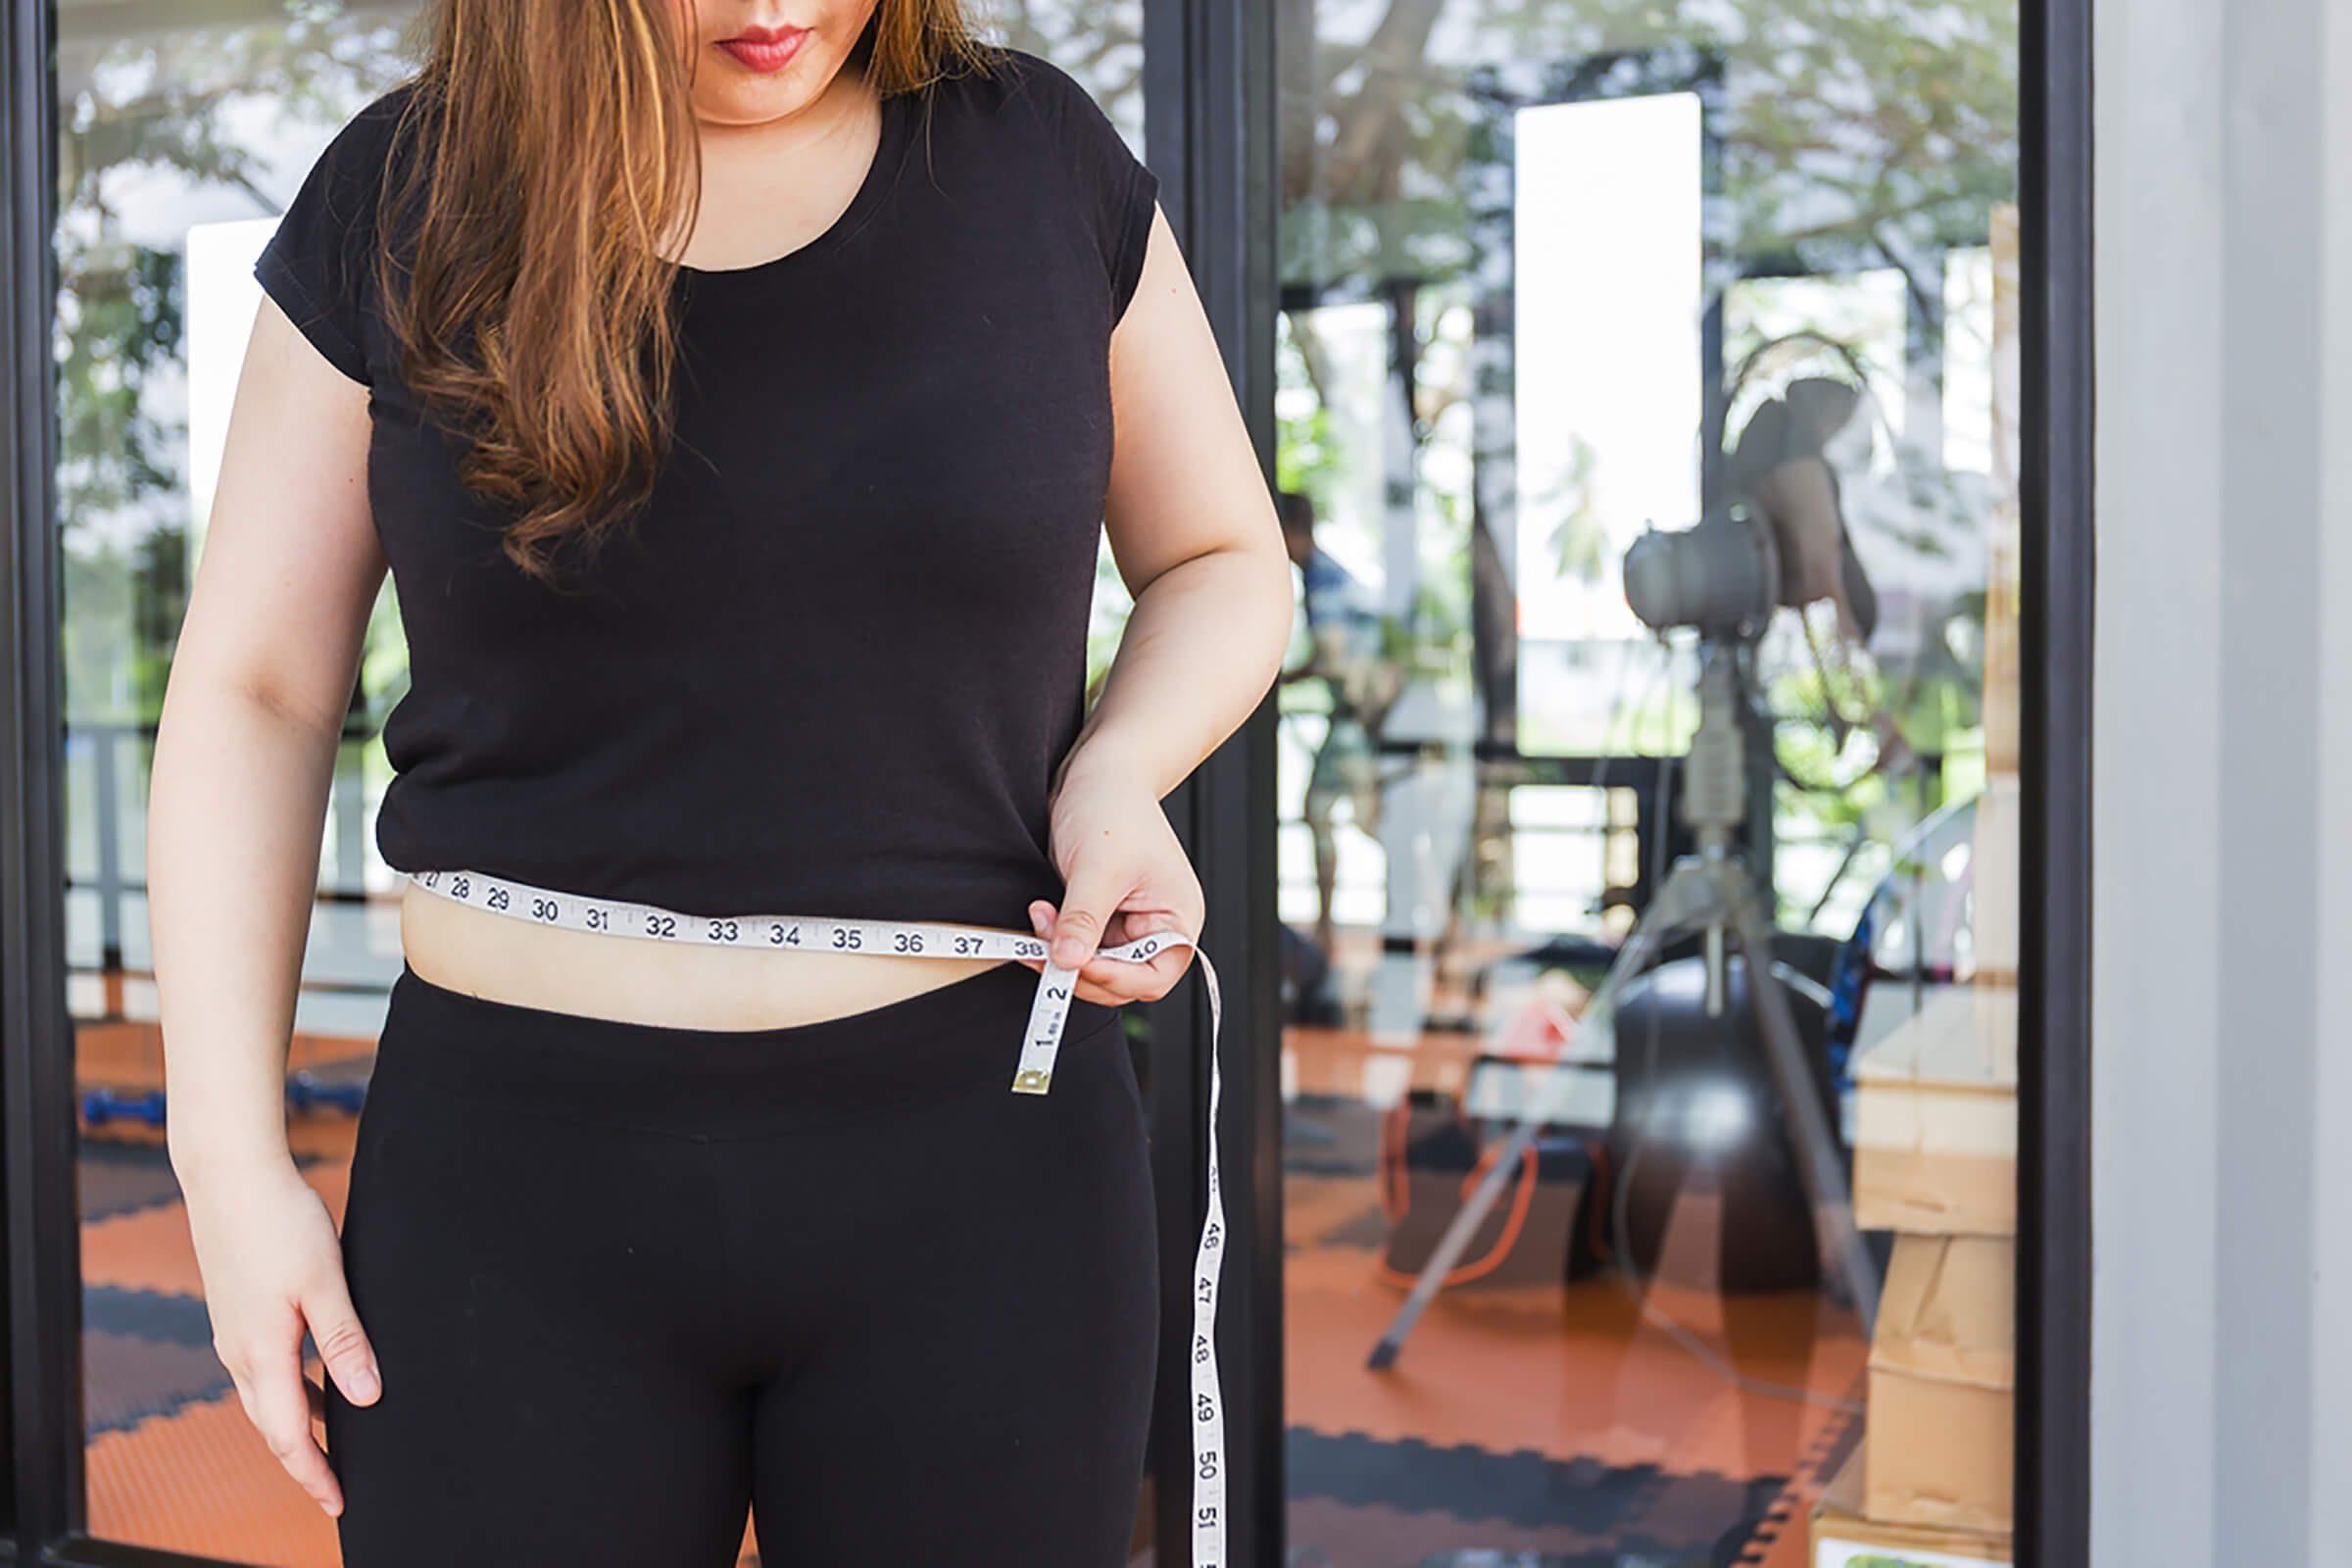 Woman-measuring-her-waistline